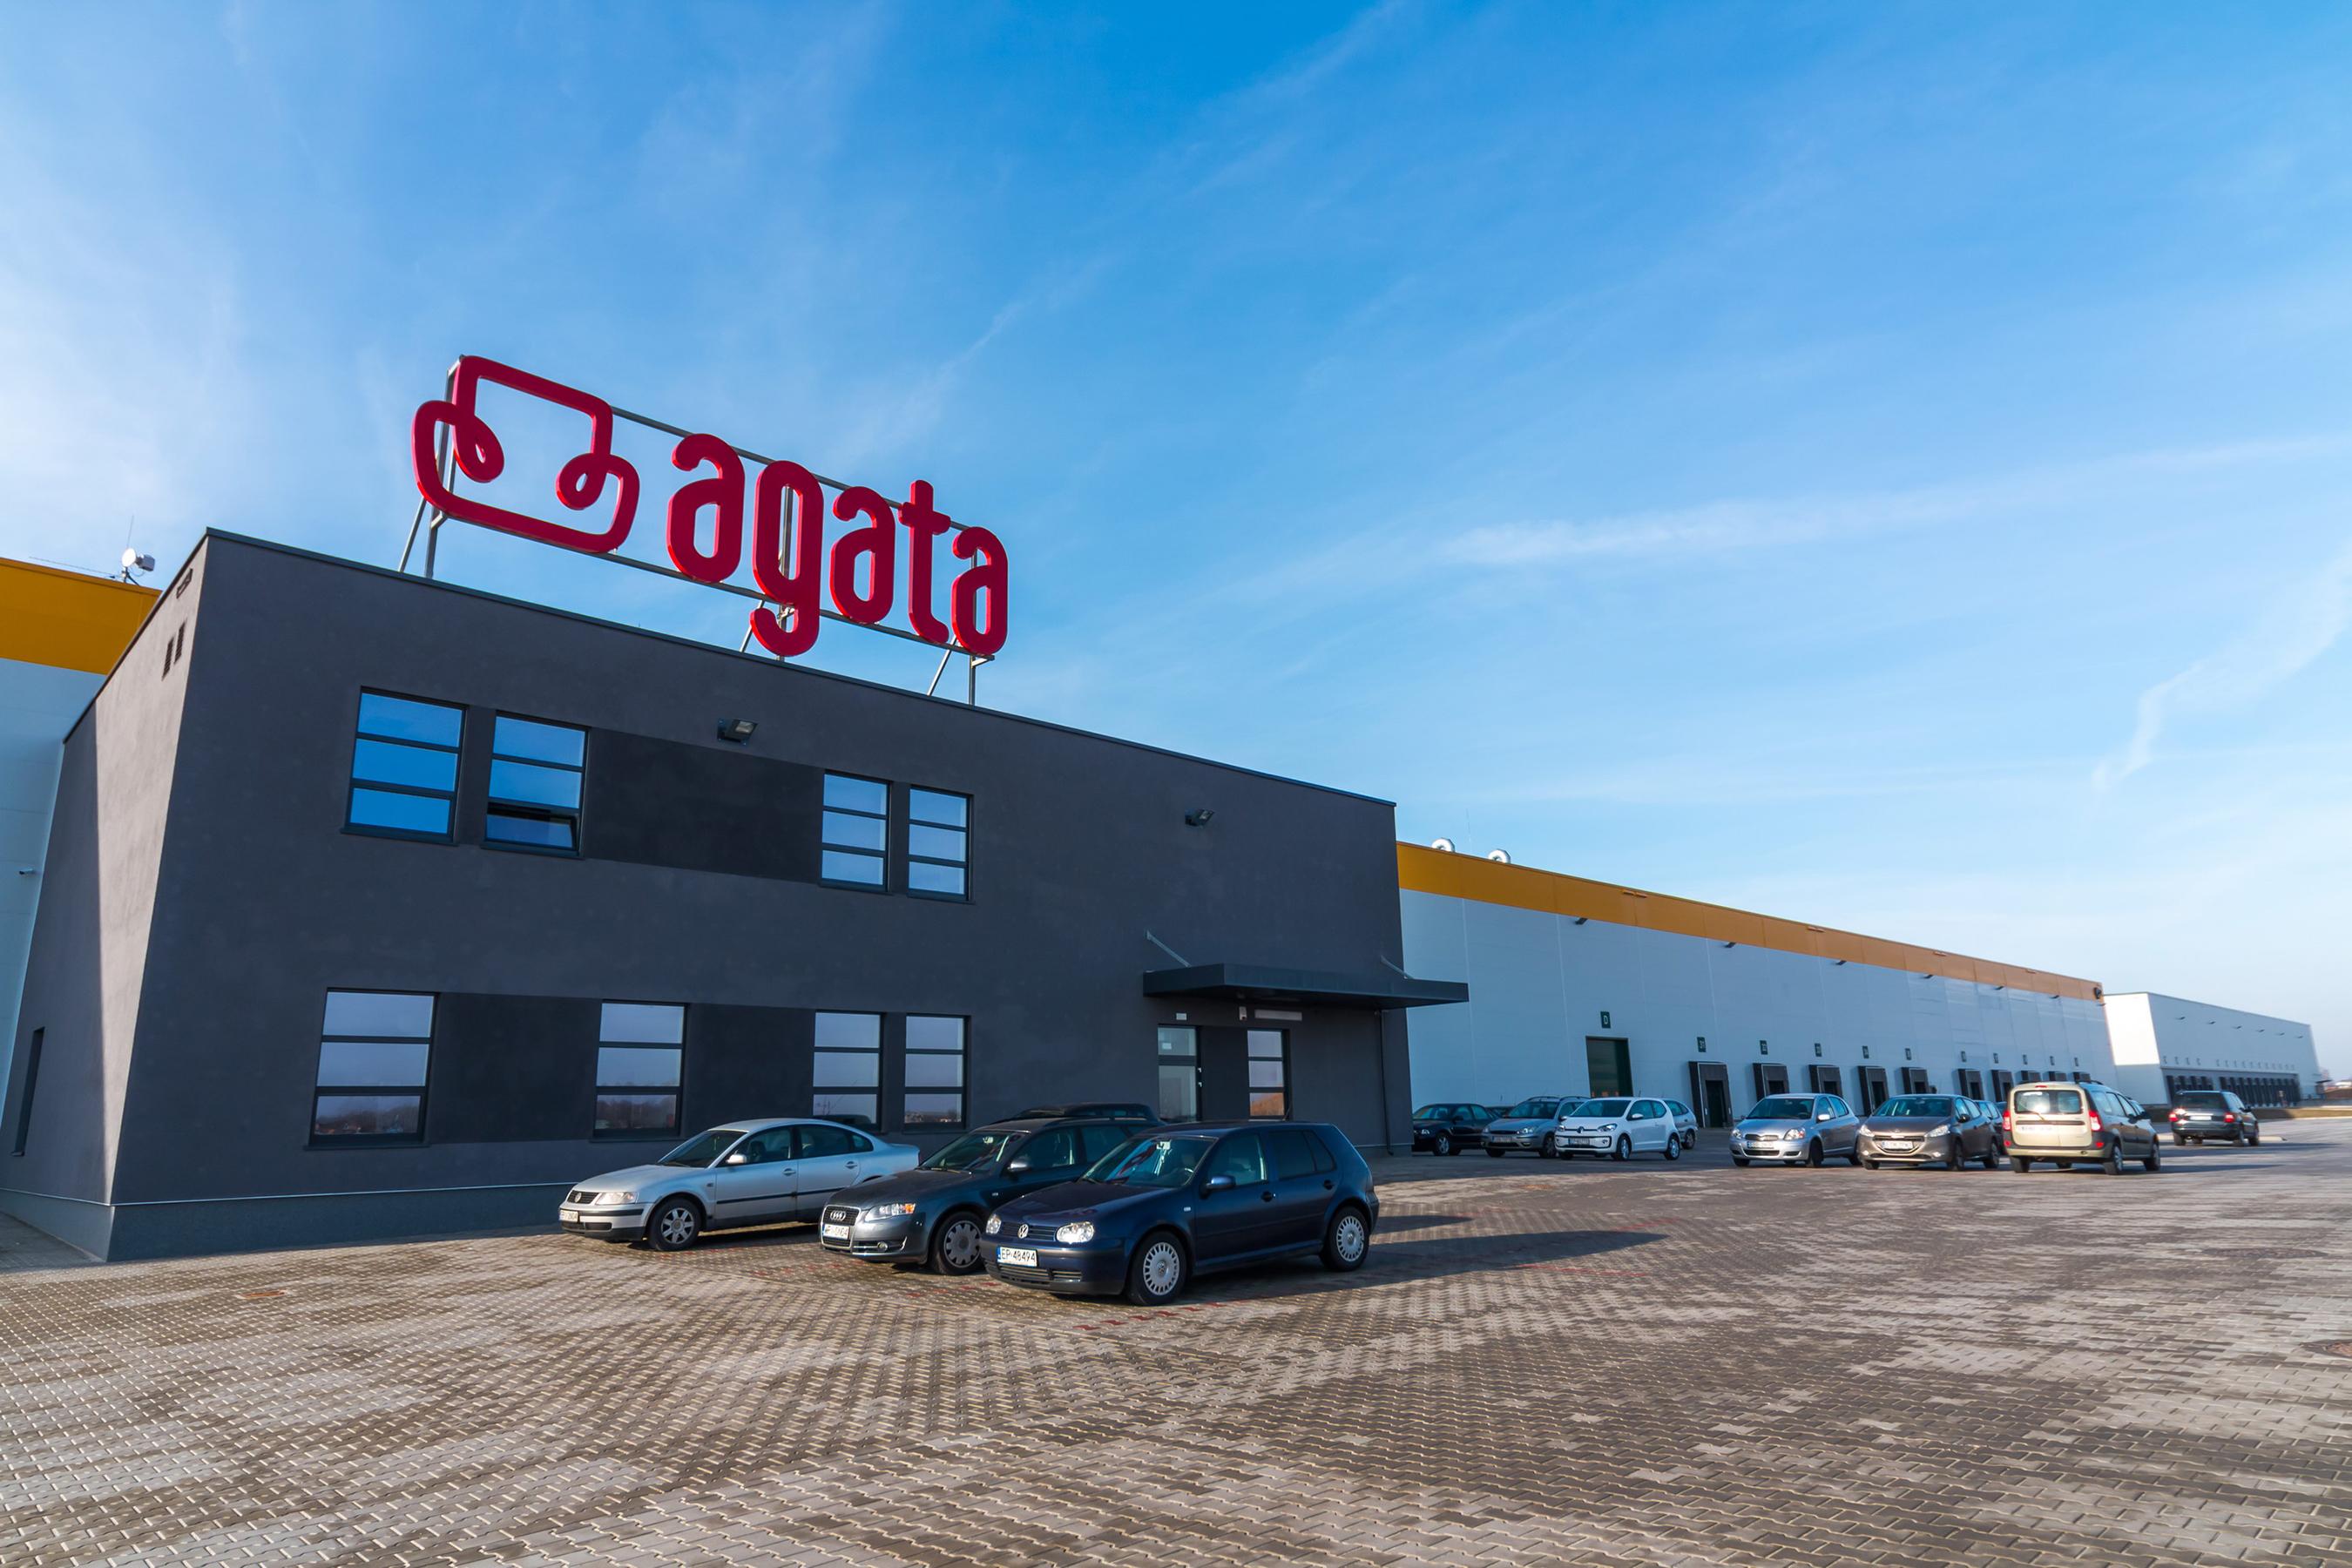 Agata: Piotrków II, Poland